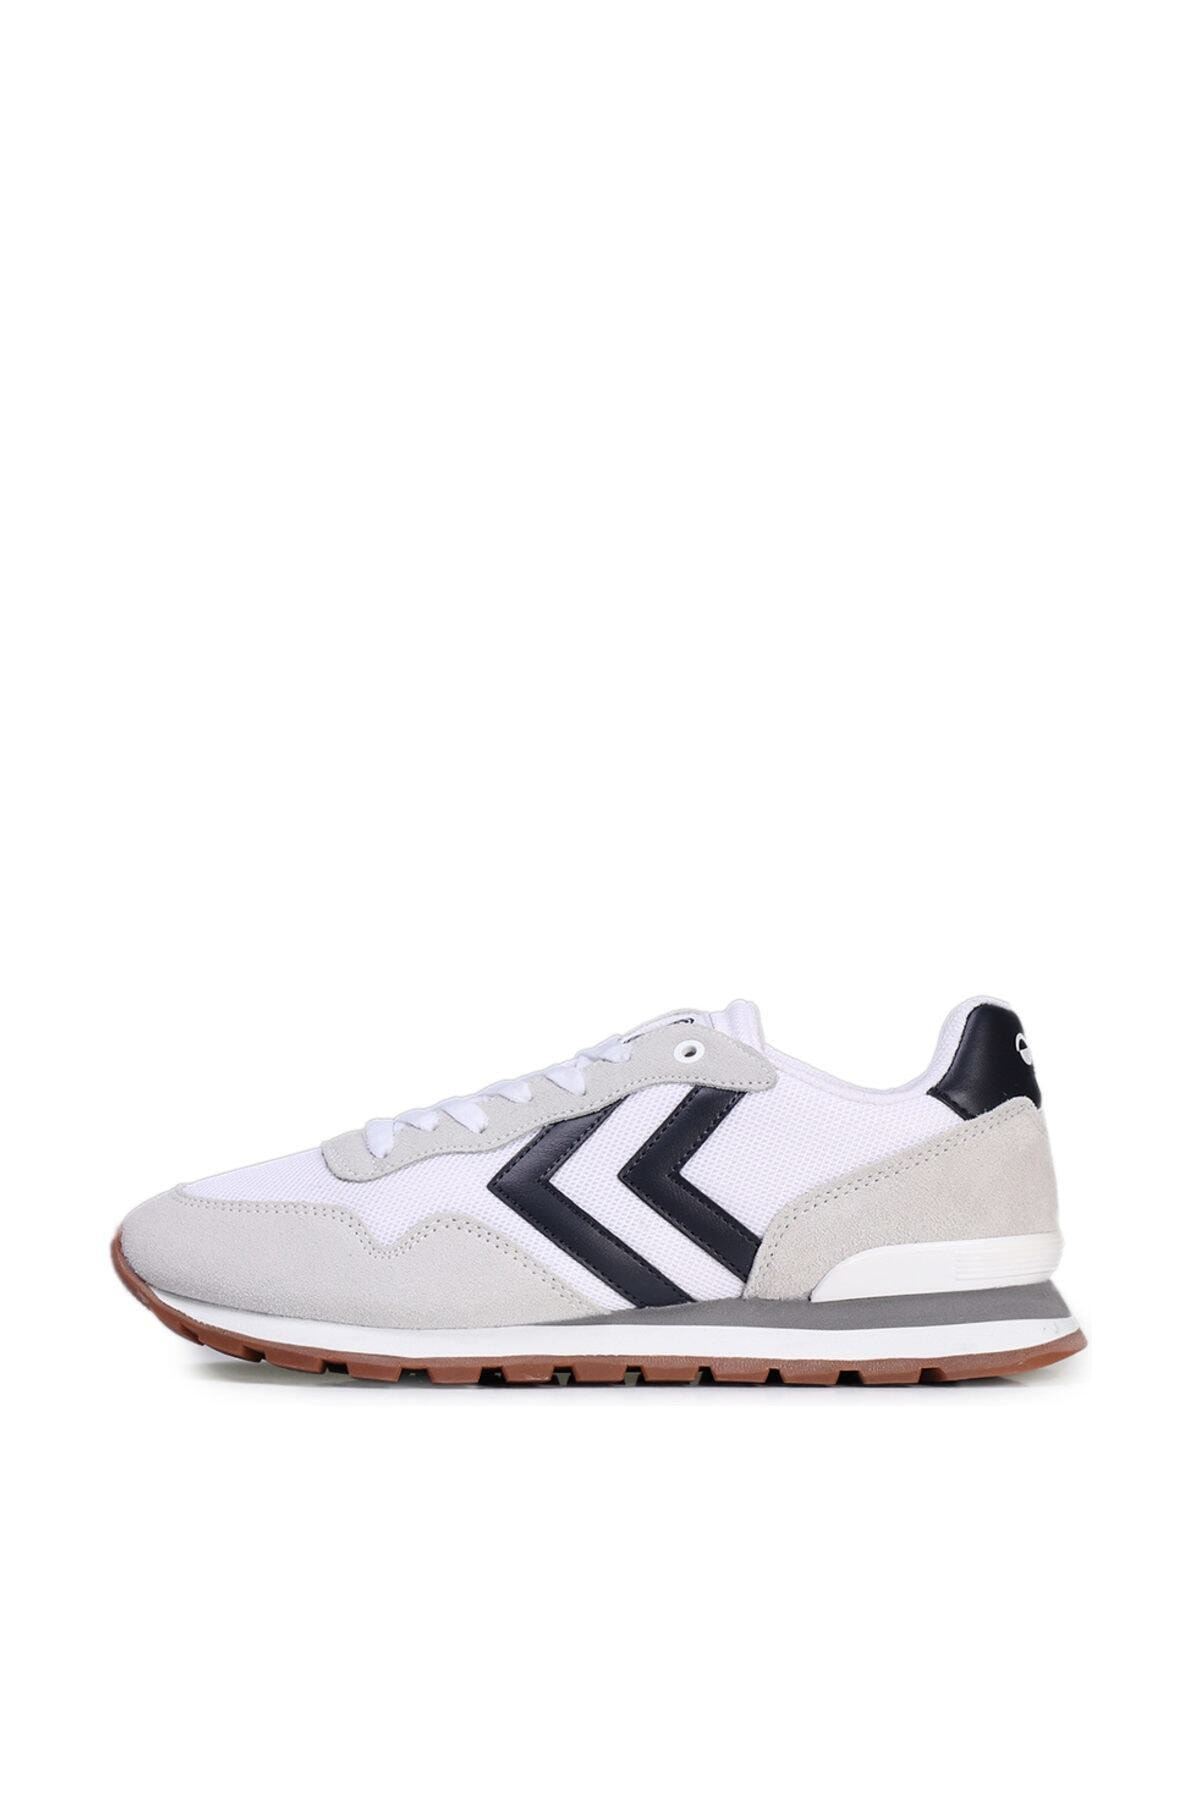 HUMMEL HMLTHOR LIFESTYLE SHOES Gri Erkek Sneaker Ayakkabı 100406430 2